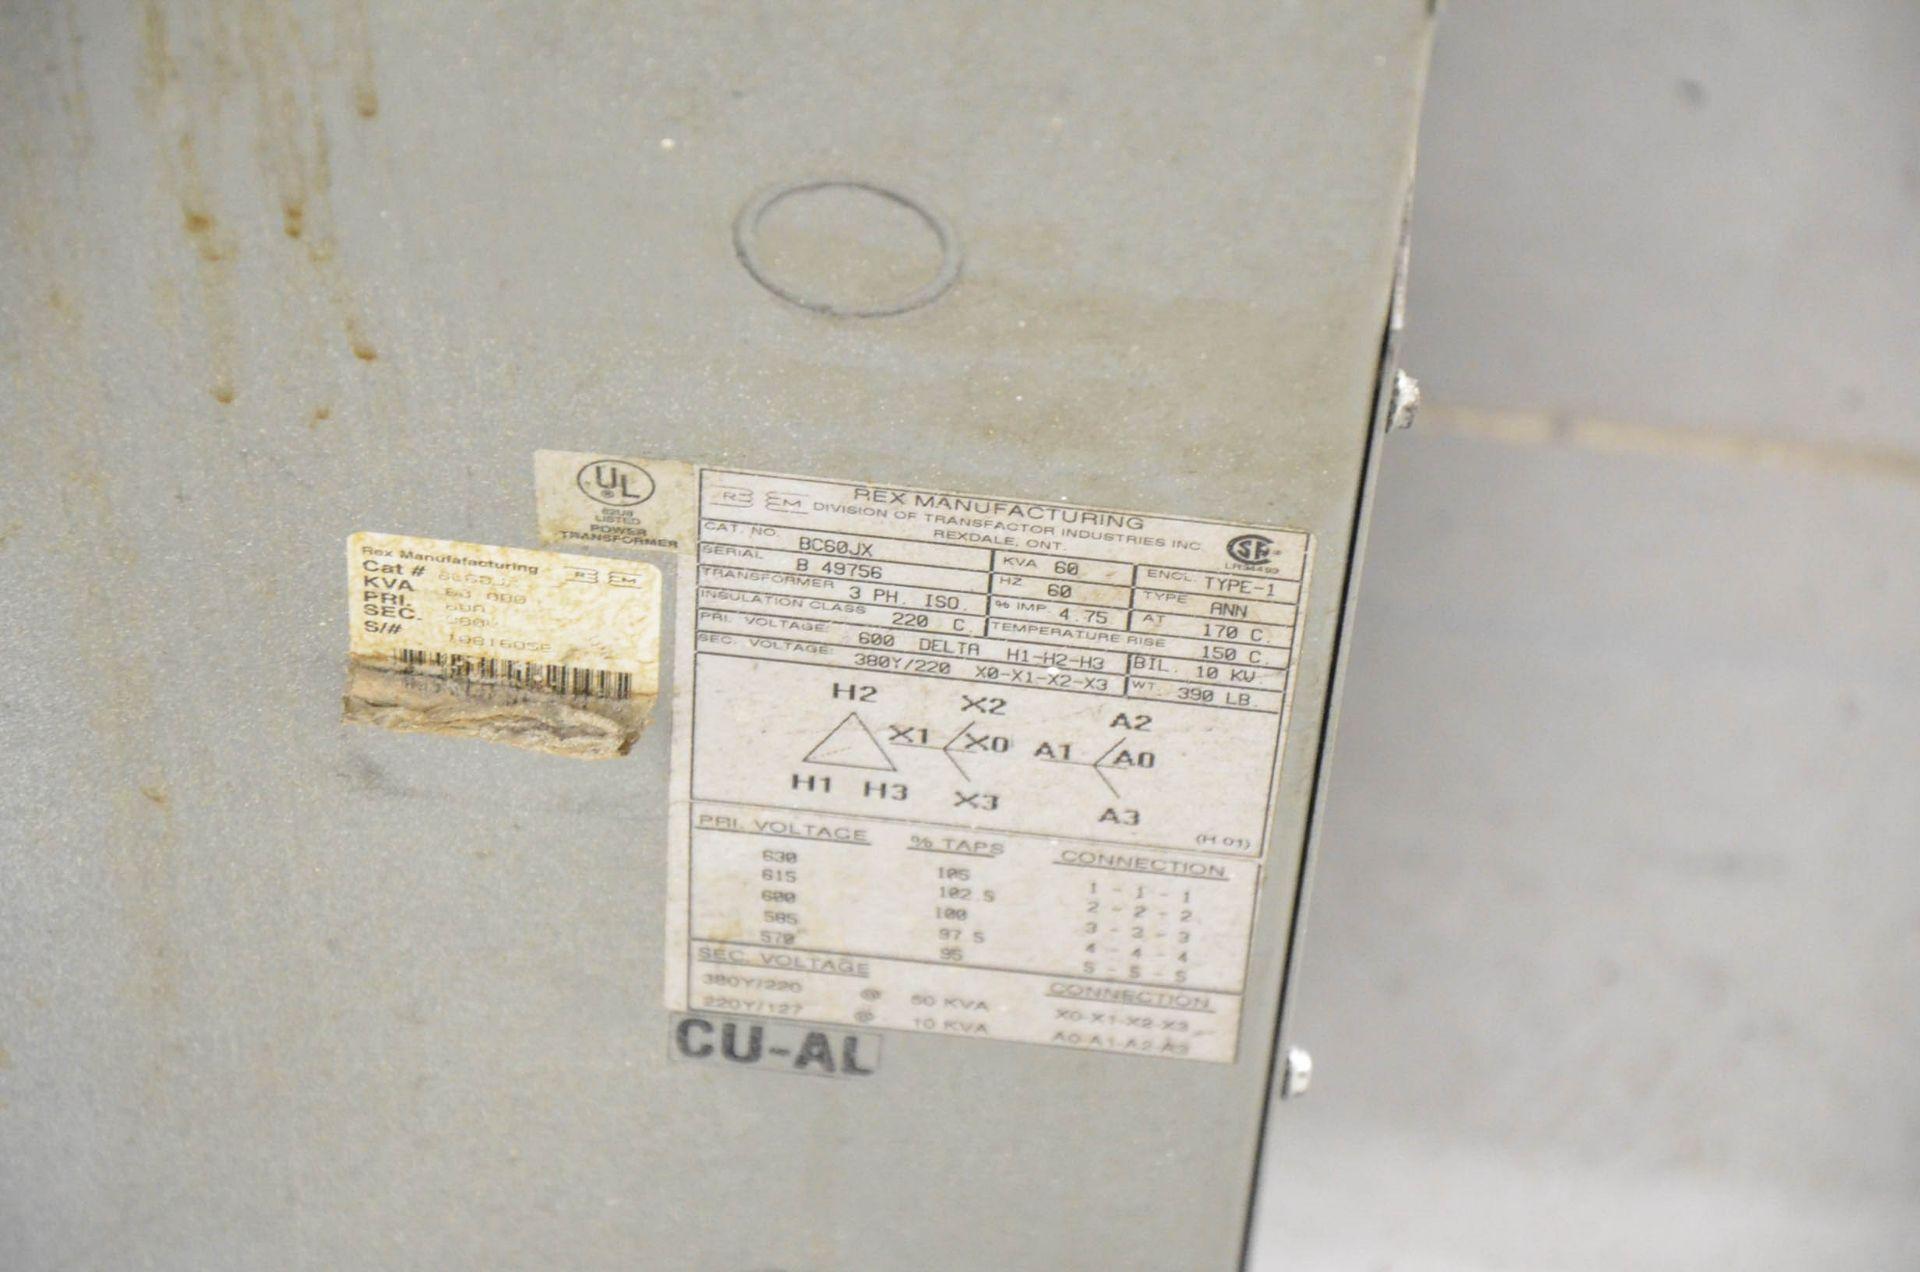 REX 60KVA/600-380-220V/3PH/60HZ TRANSFORMER (CI) [RIGGING FEES FOR LOT #415 - $50 USD PLUS - Image 2 of 2